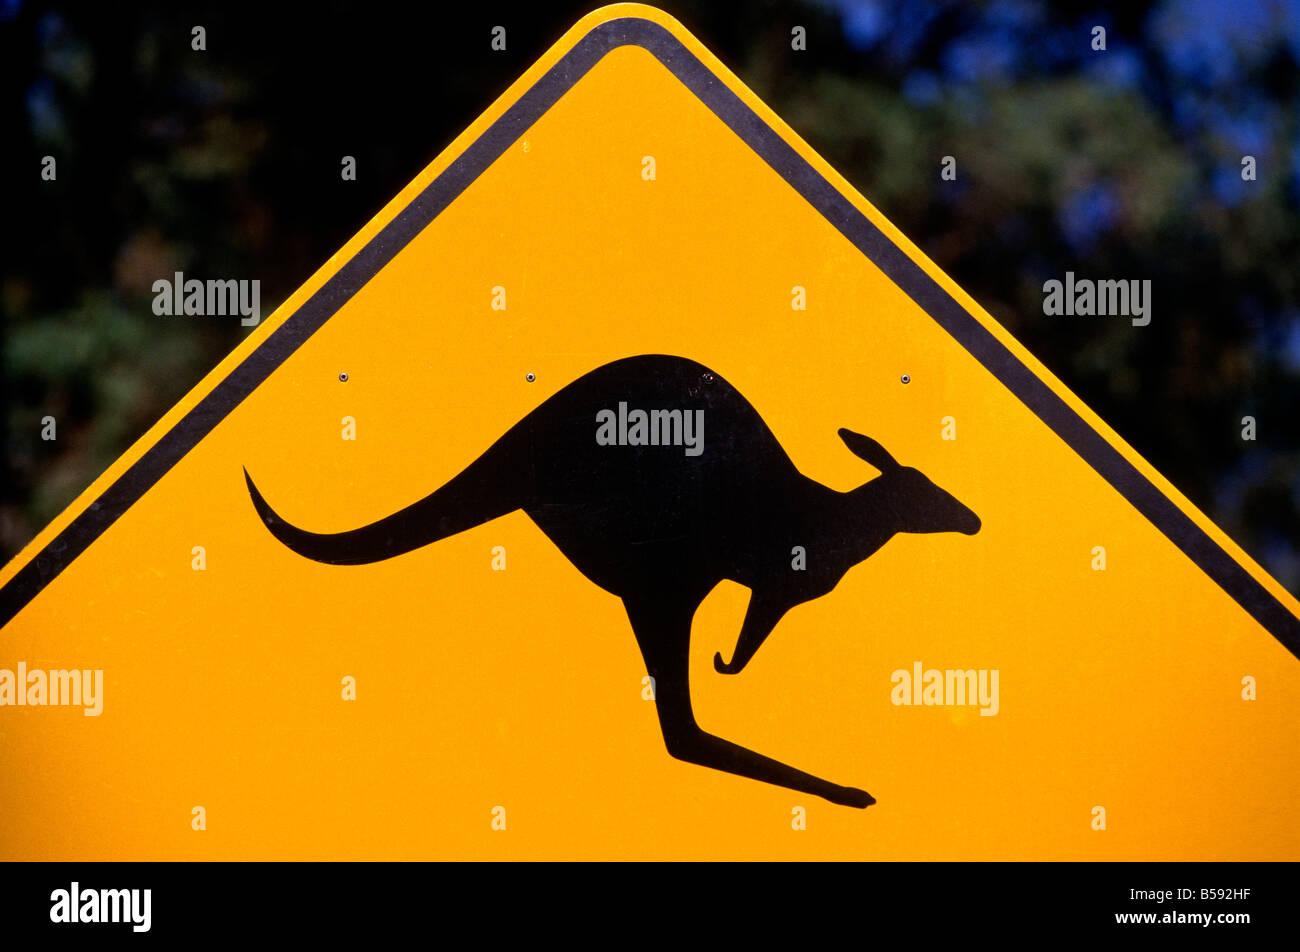 Kangaroo roadsign, Australia - Stock Image